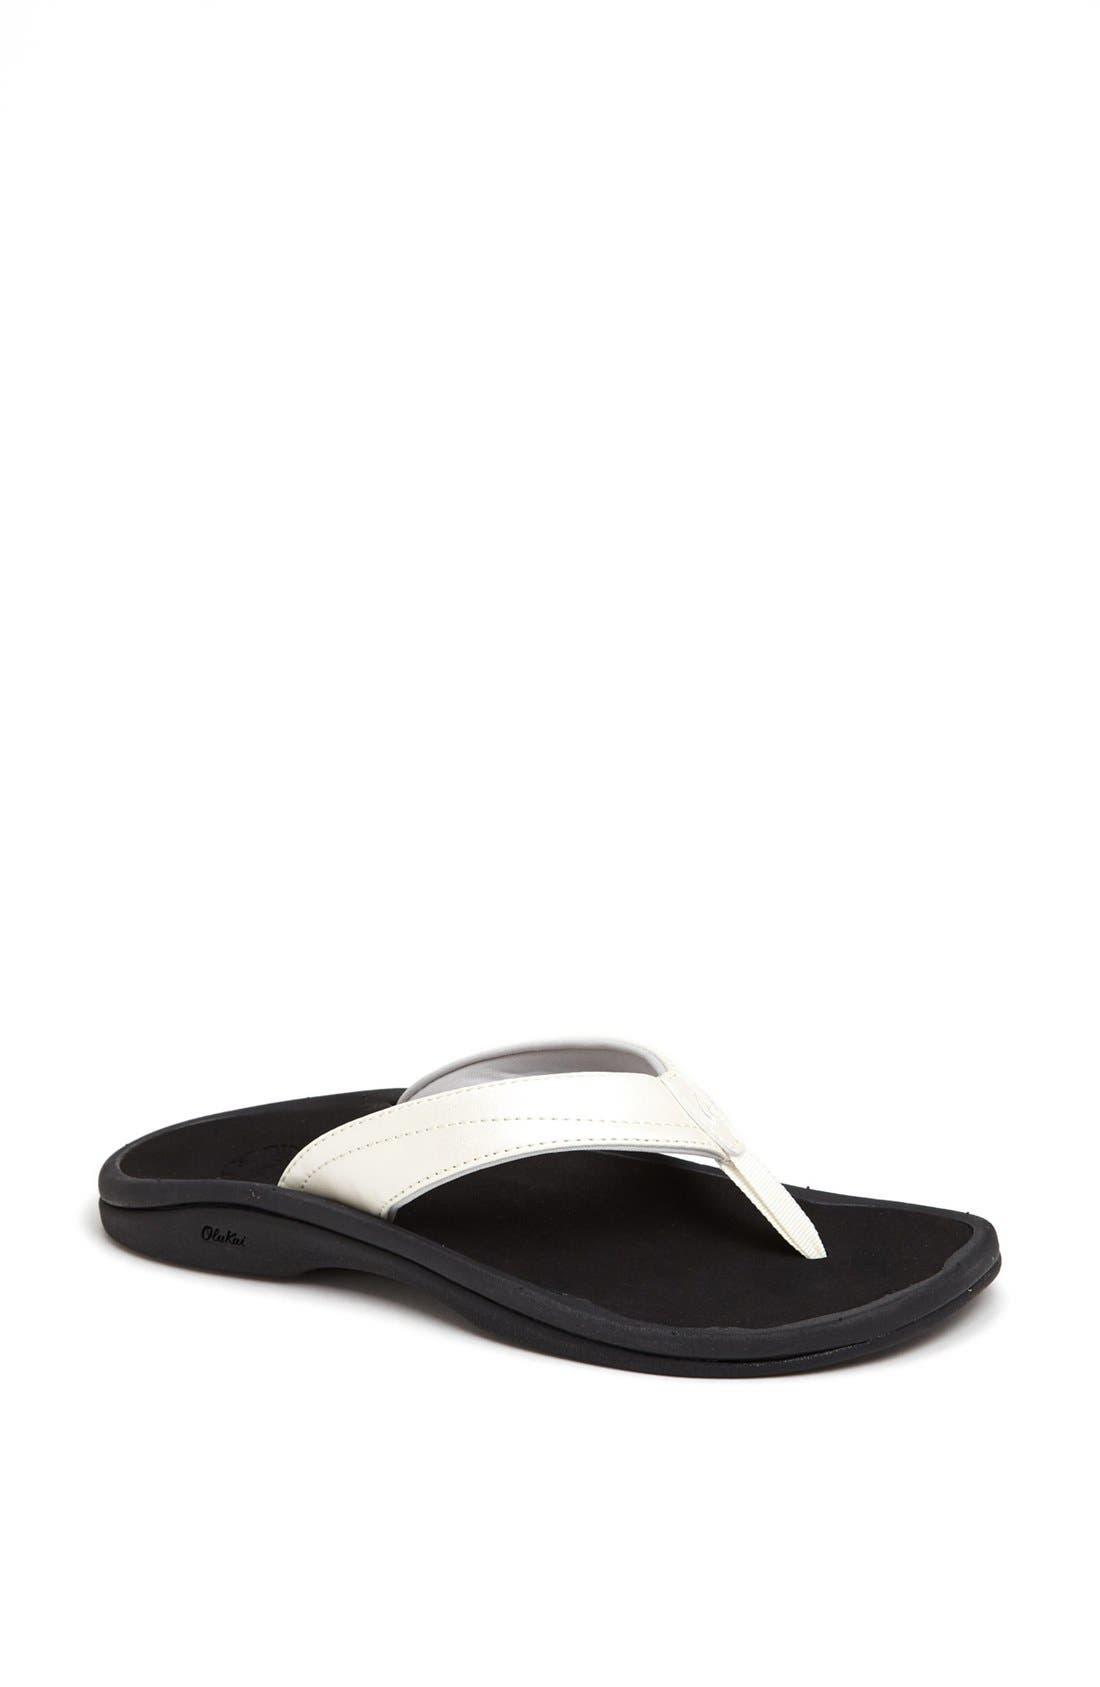 OLUKAI 'Ohana' Sandal